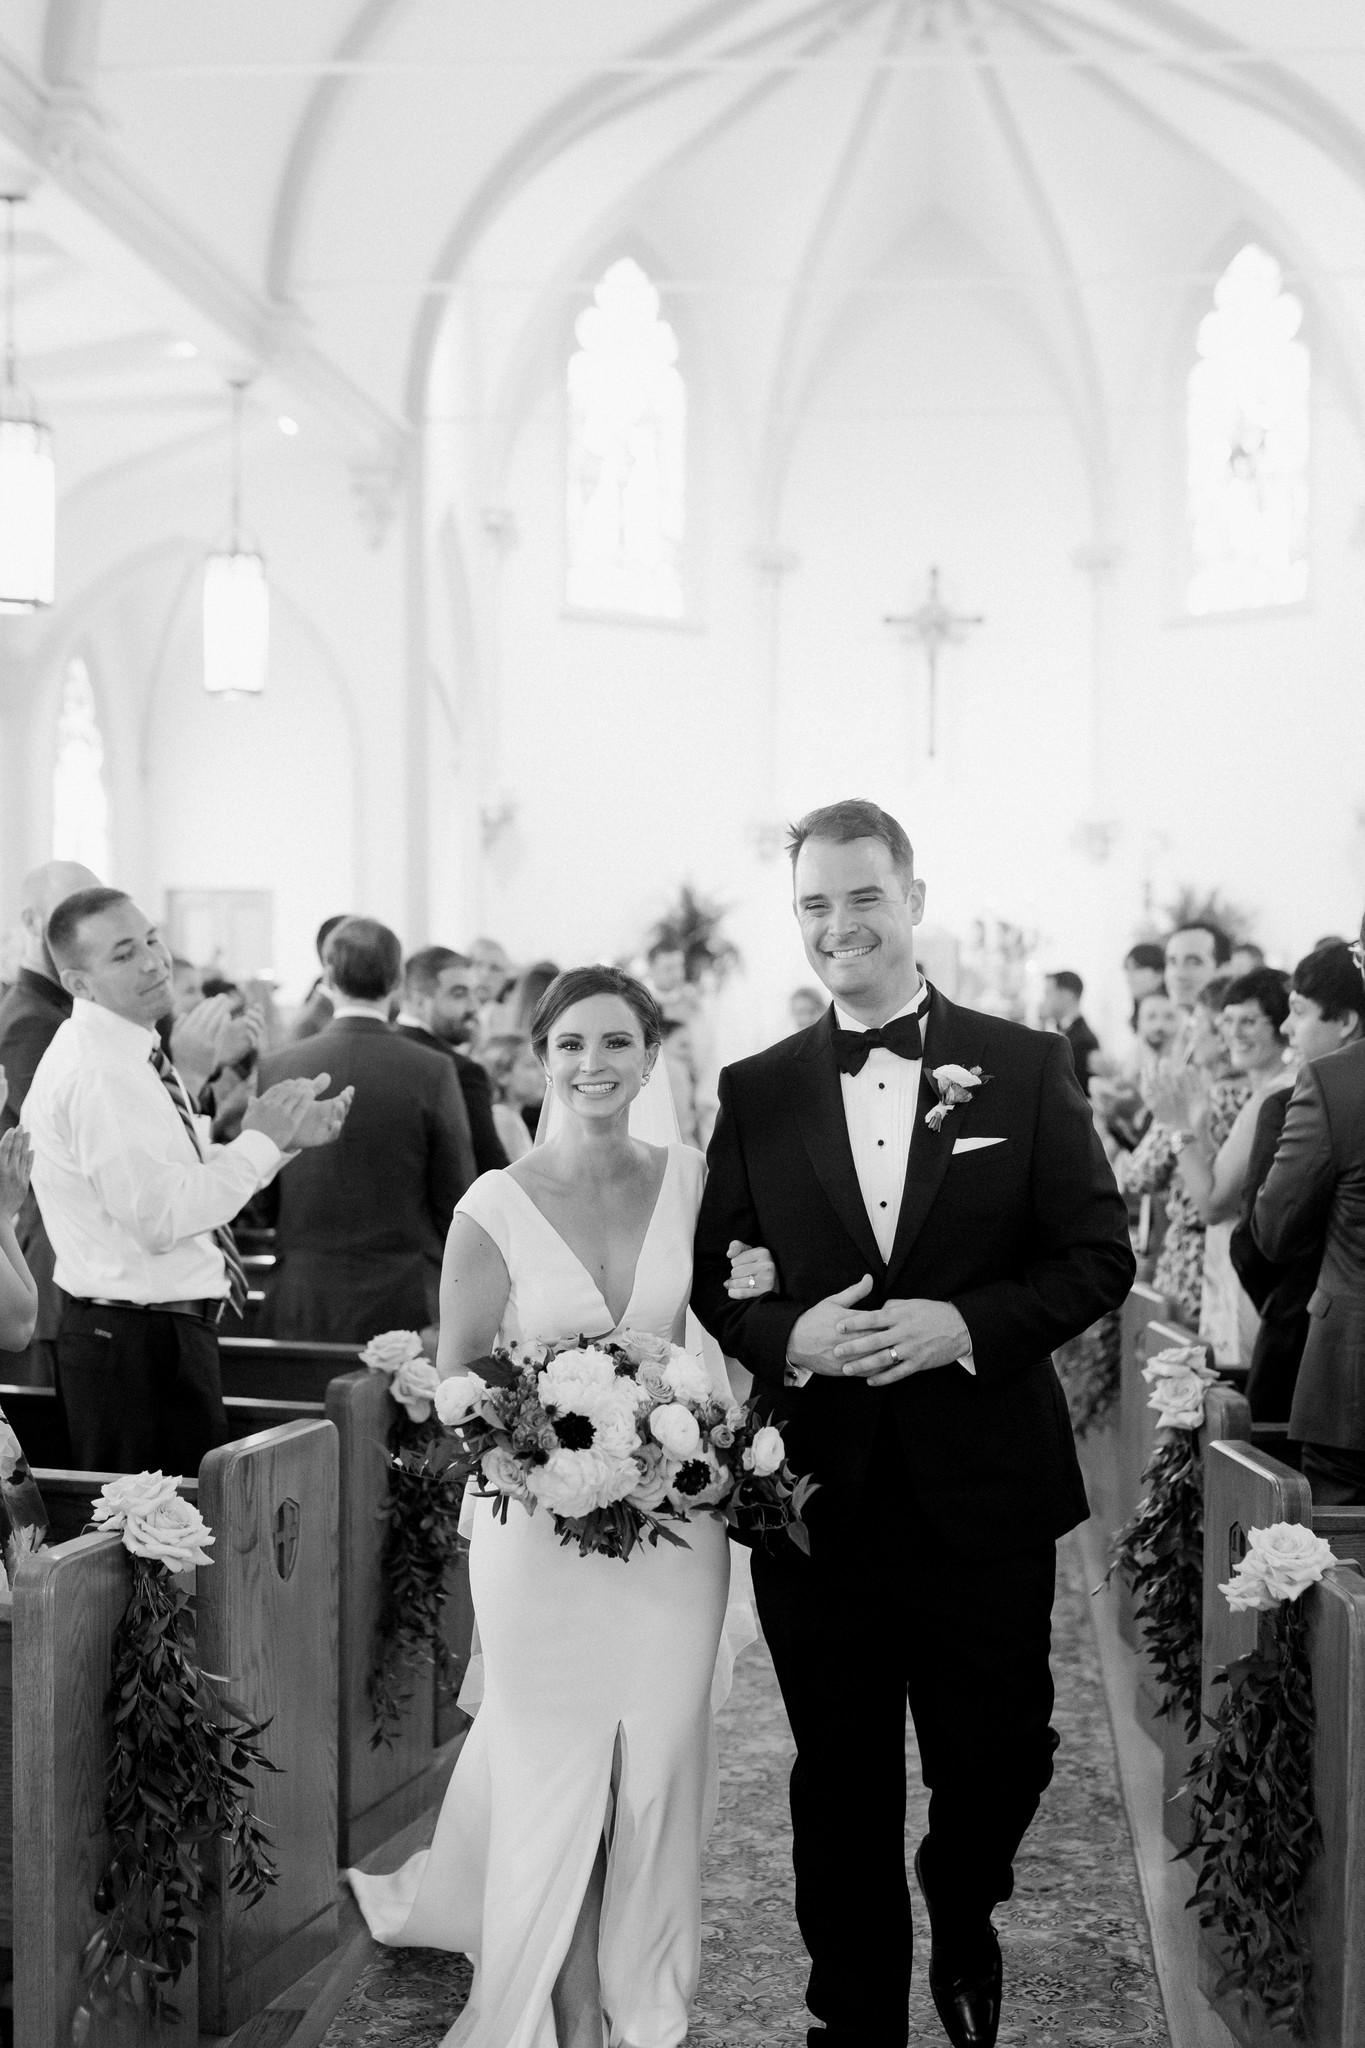 branford house wedding_ct wedding photographer_ct wedding-24_Easy-Resize.com.jpg